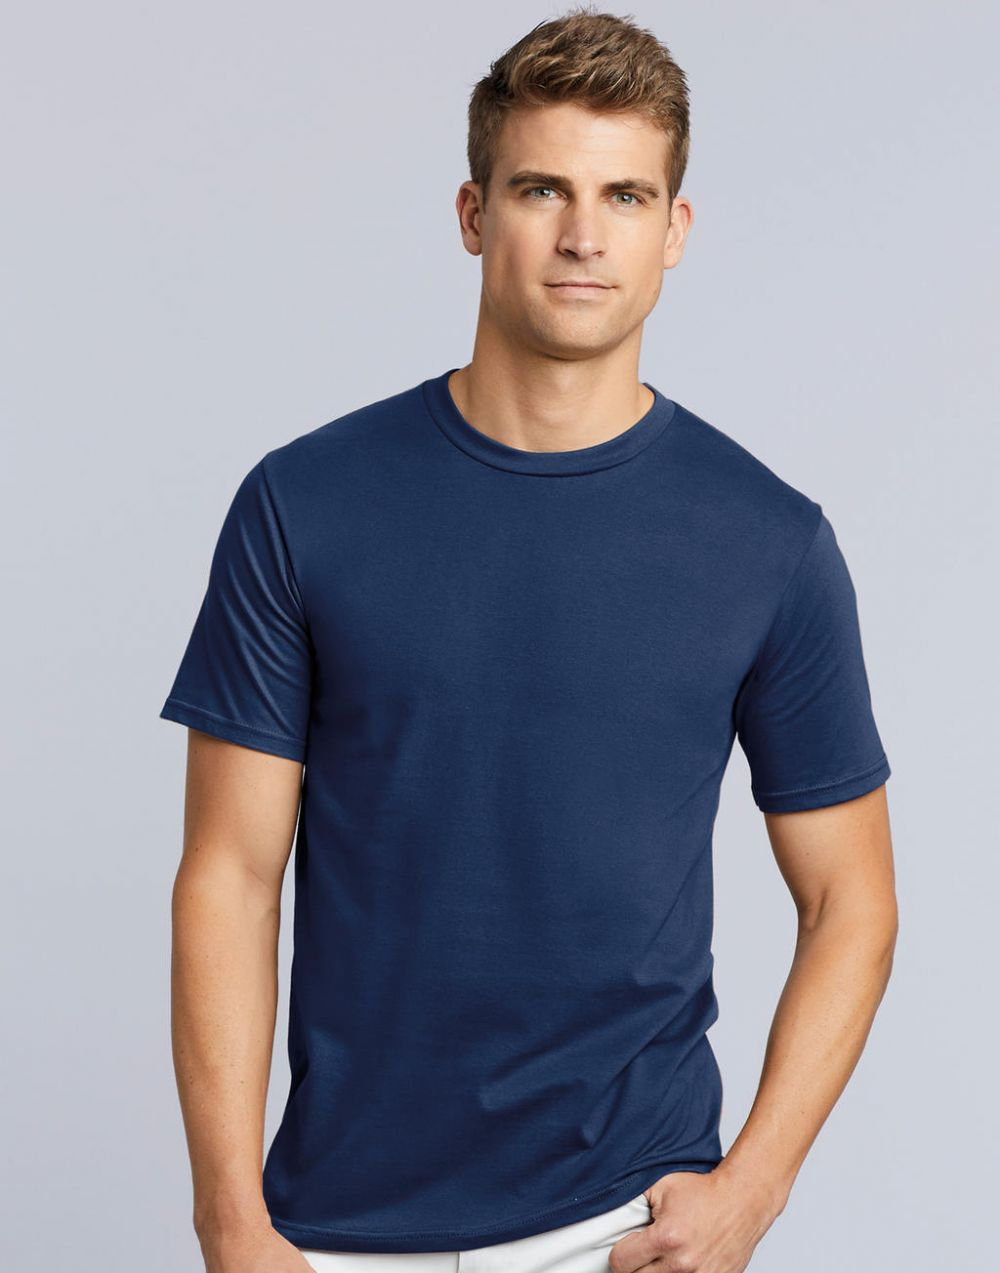 Camisetas manga corta gildan premium 185 gr para personalizar imagen 1